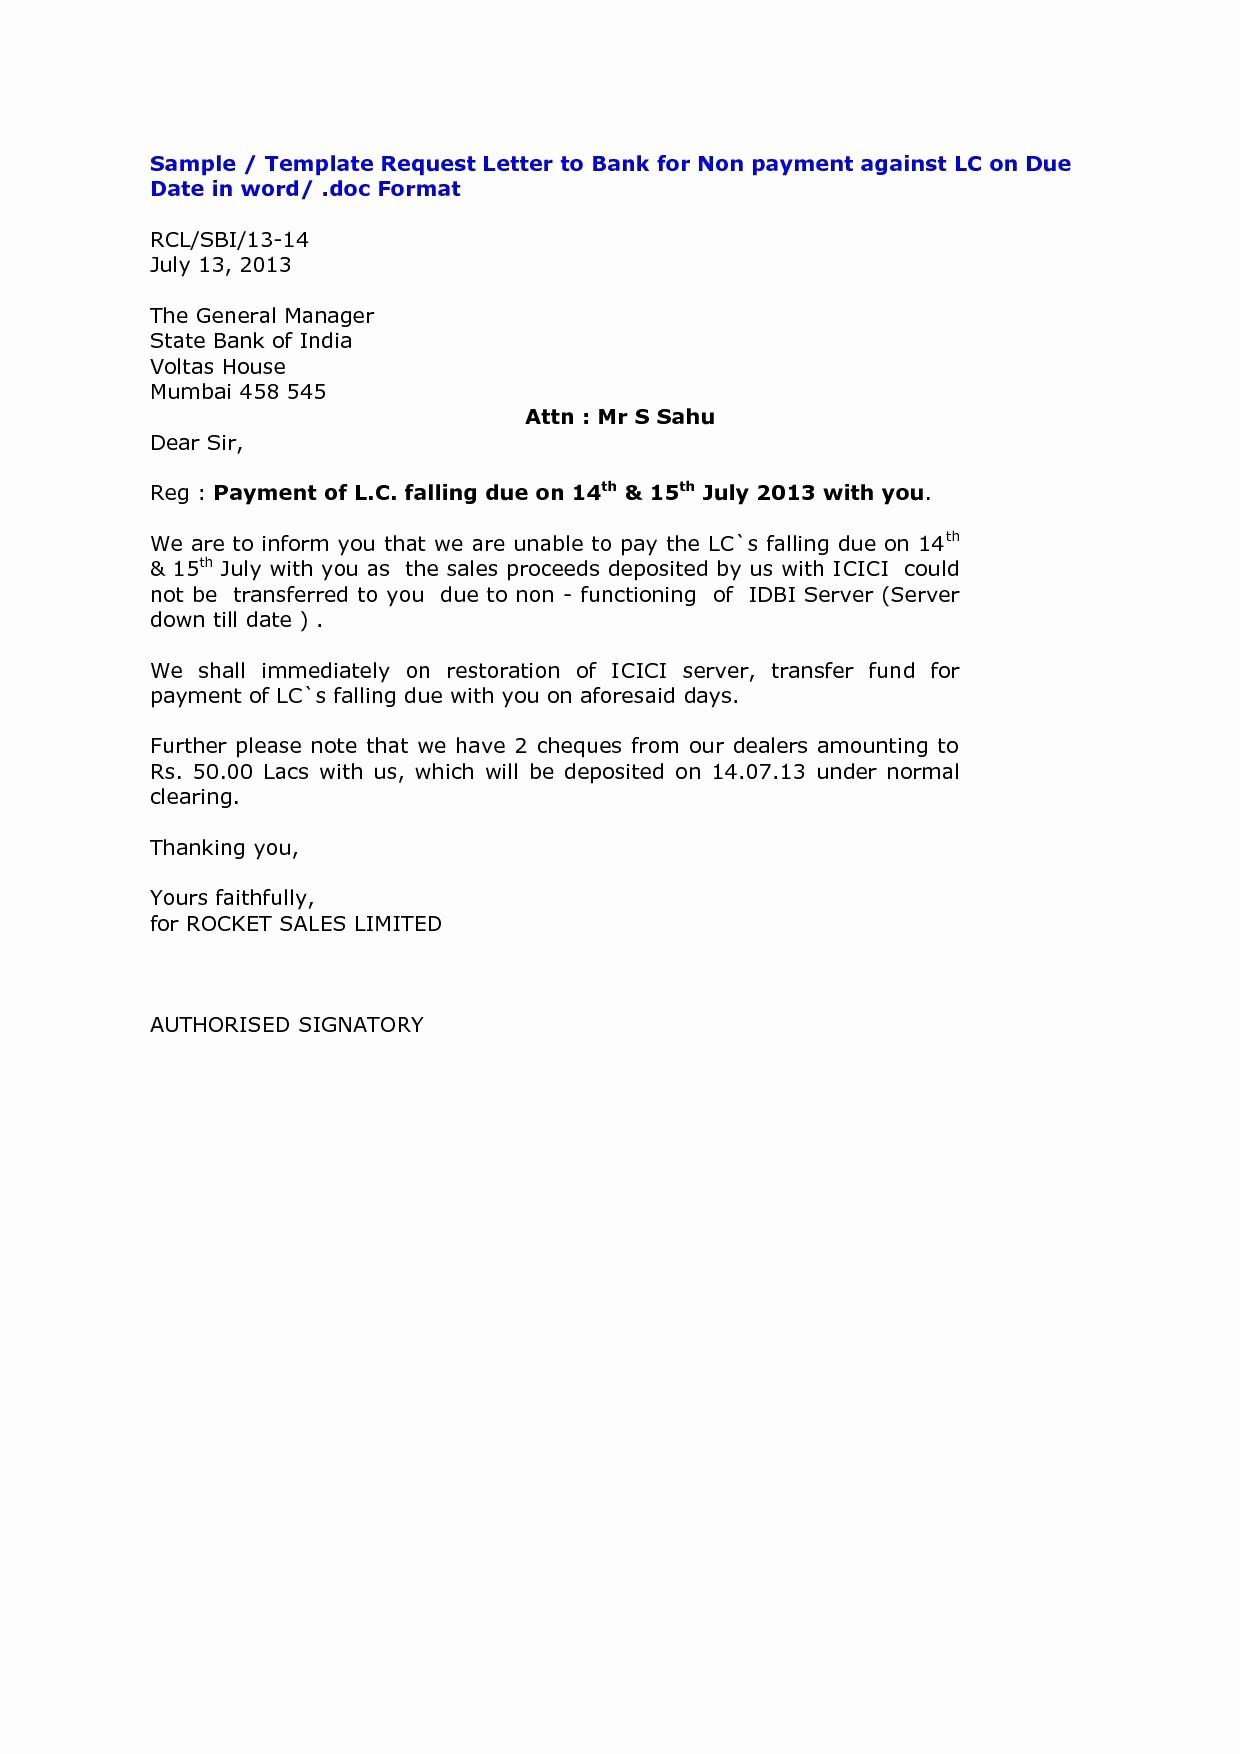 Sample Letter Of Reimbursement Money Inspirational Refund Demand Letter Template Samples